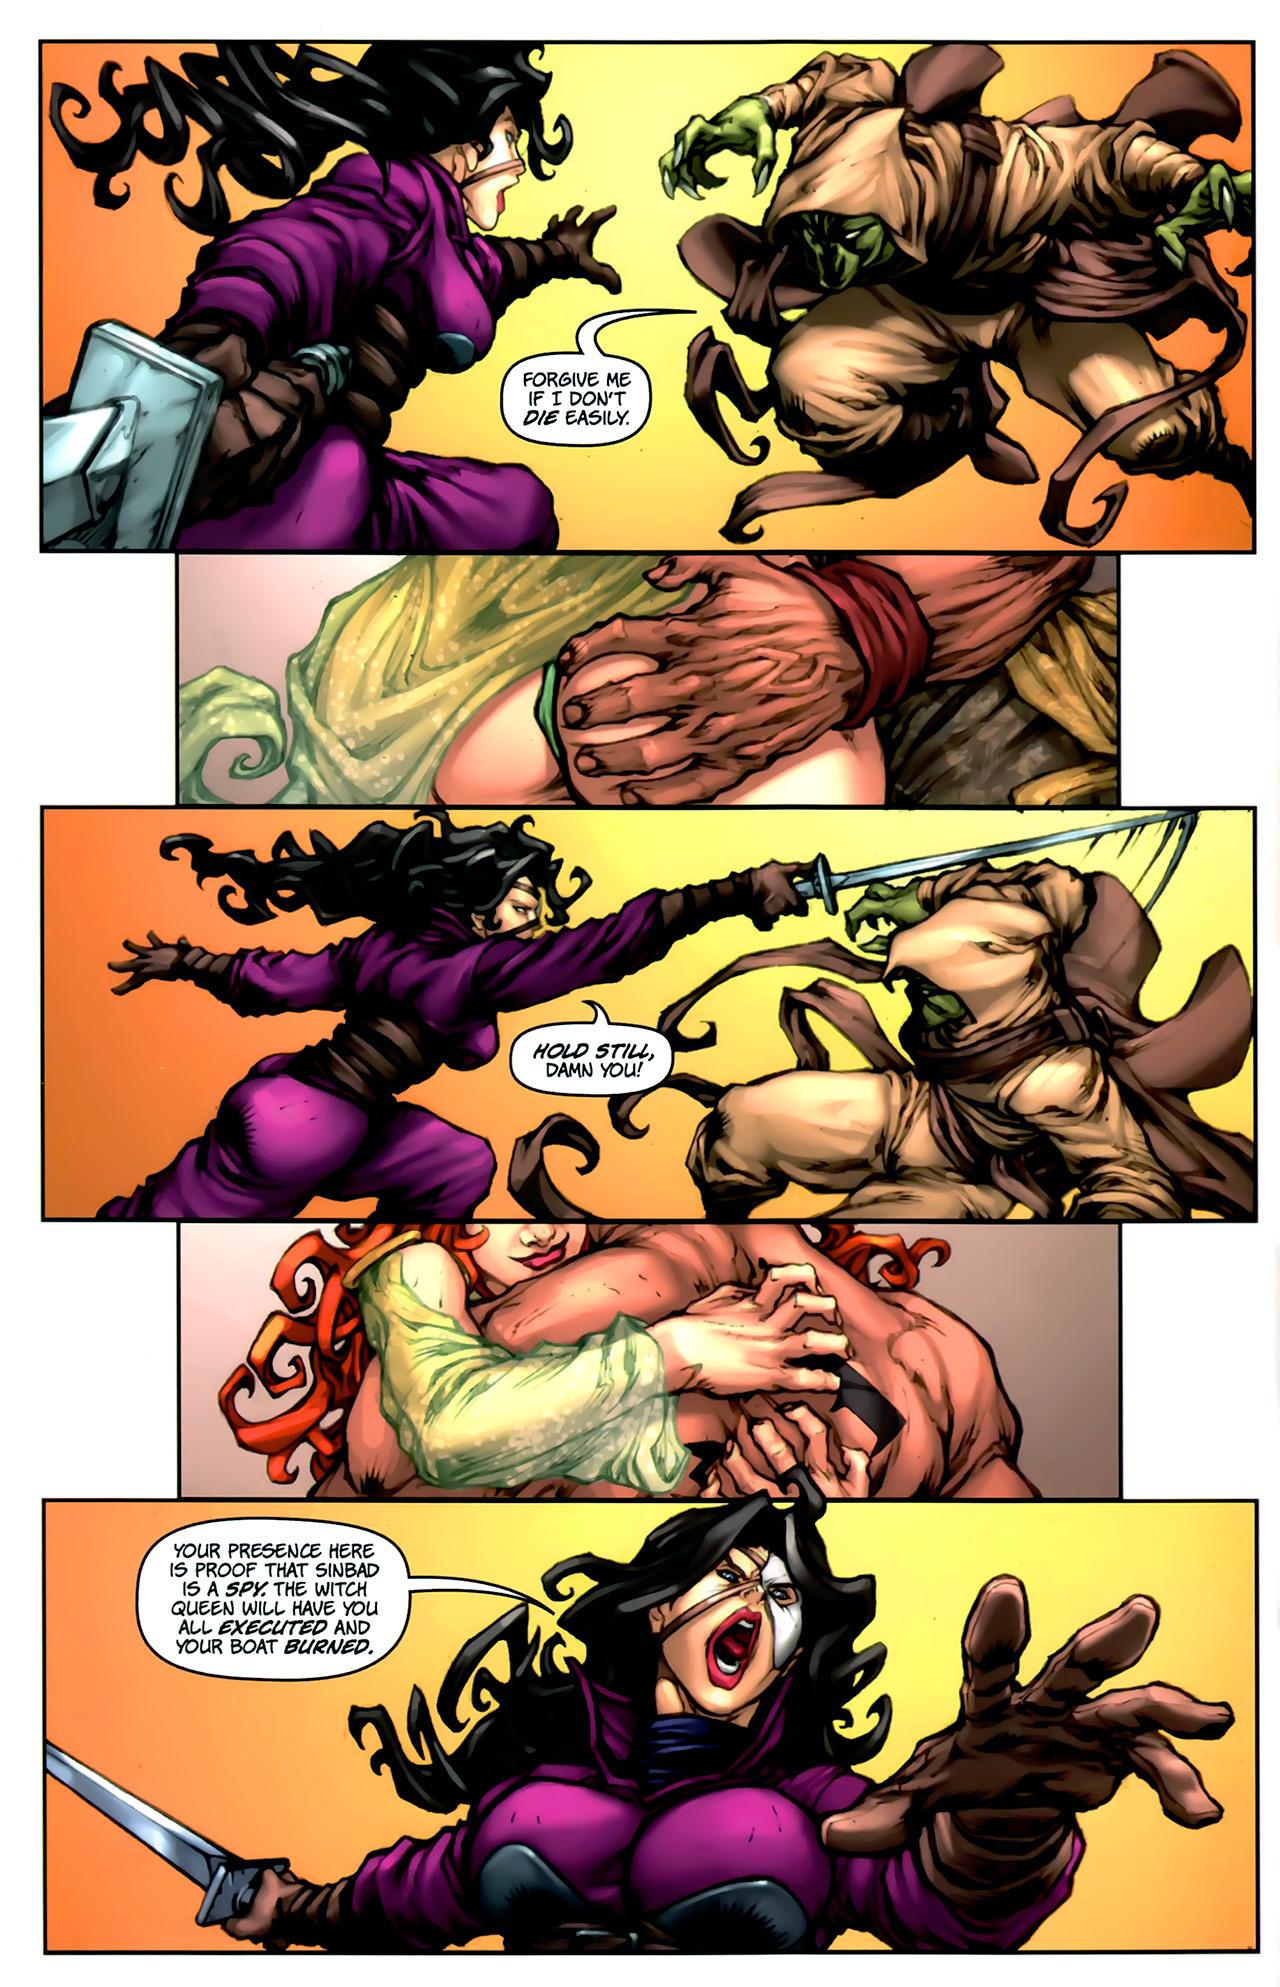 Read online 1001 Arabian Nights: The Adventures of Sinbad comic -  Issue #2 - 10